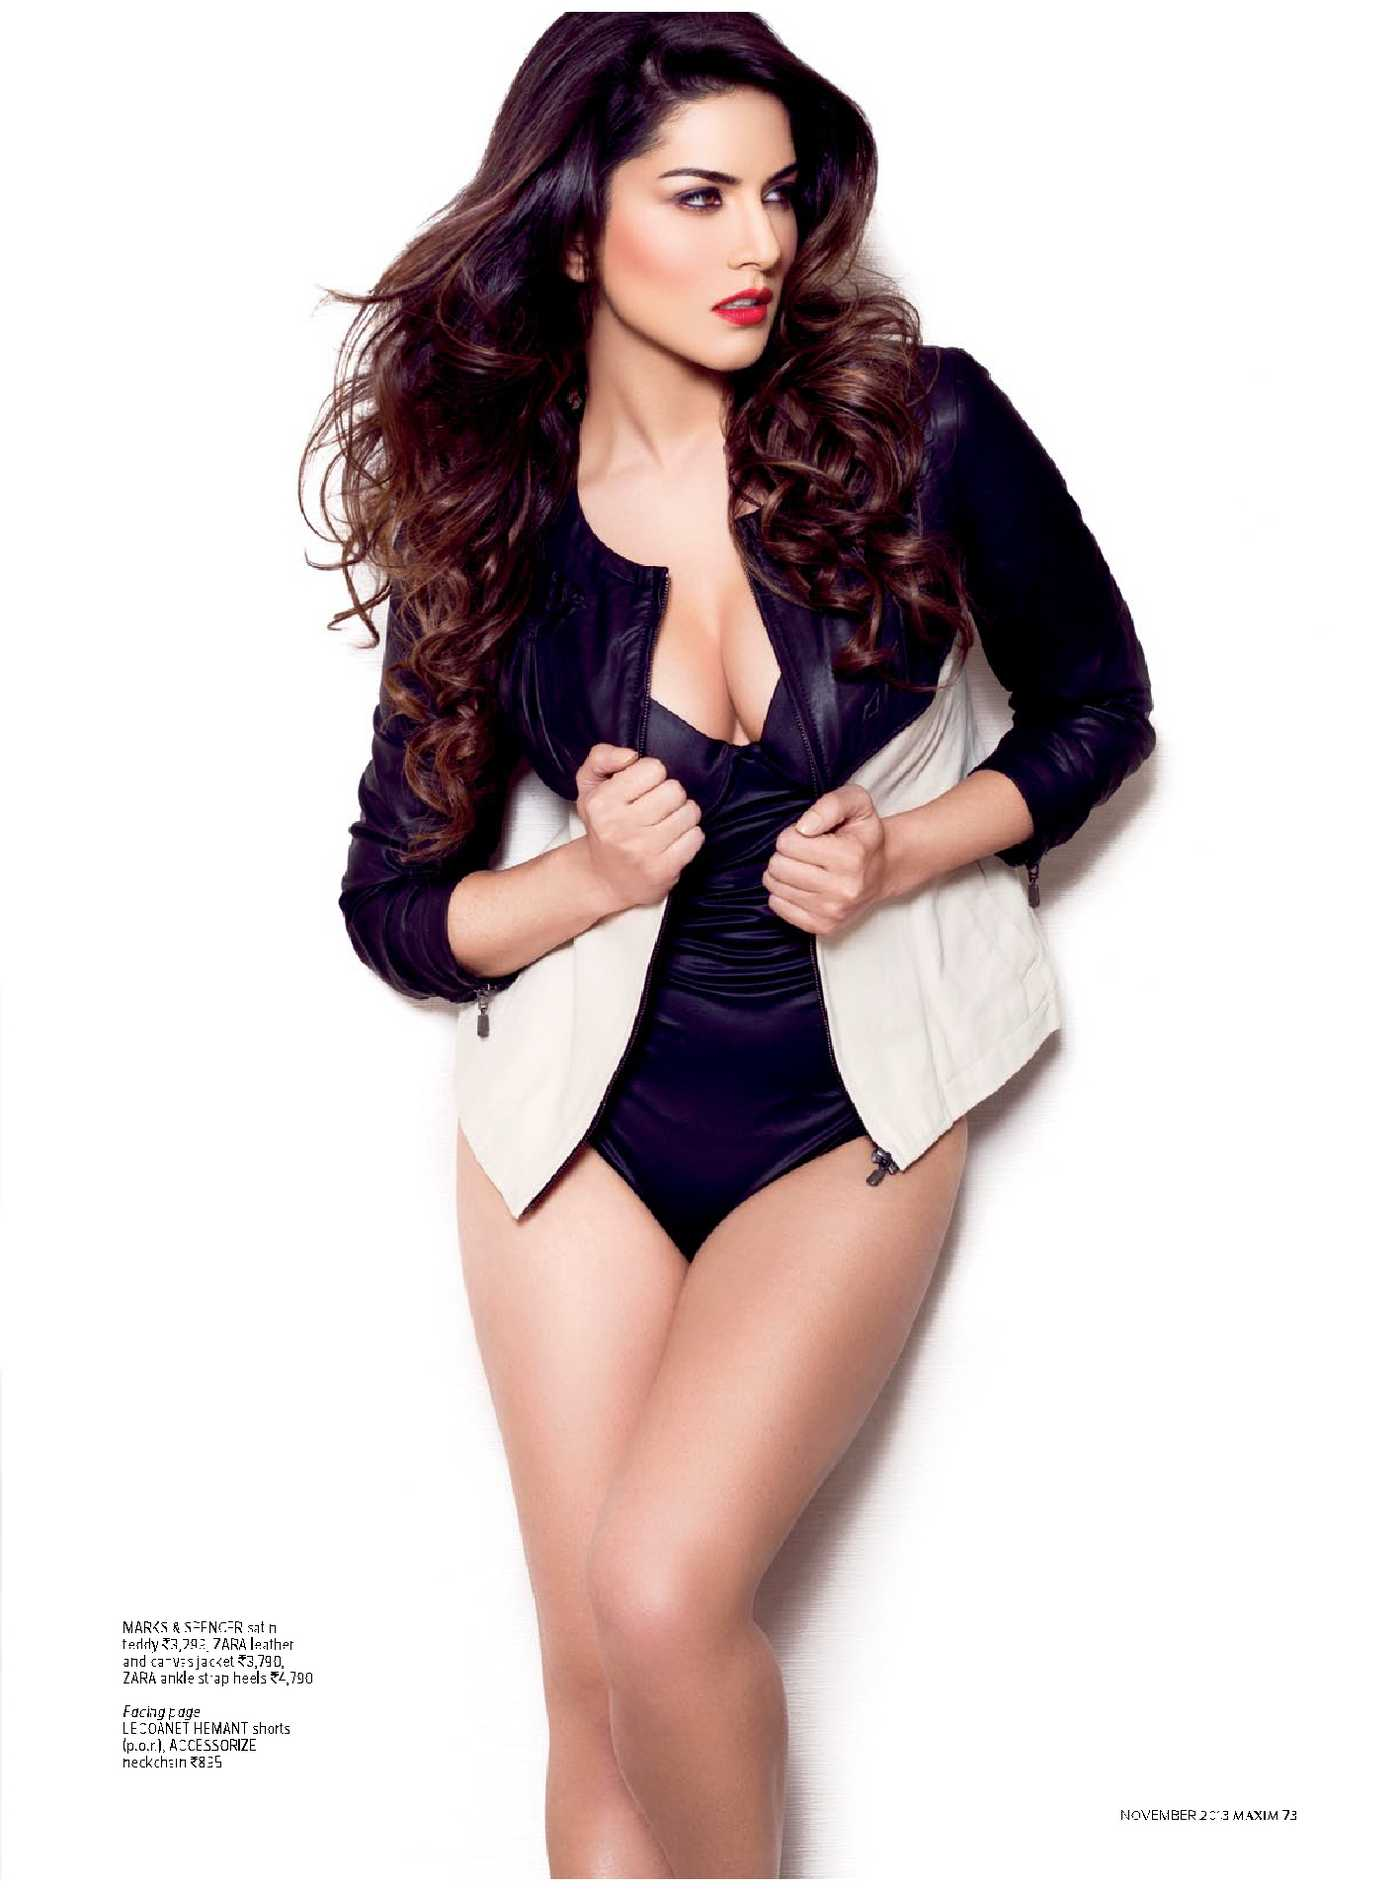 Sunny Leone Maxim India